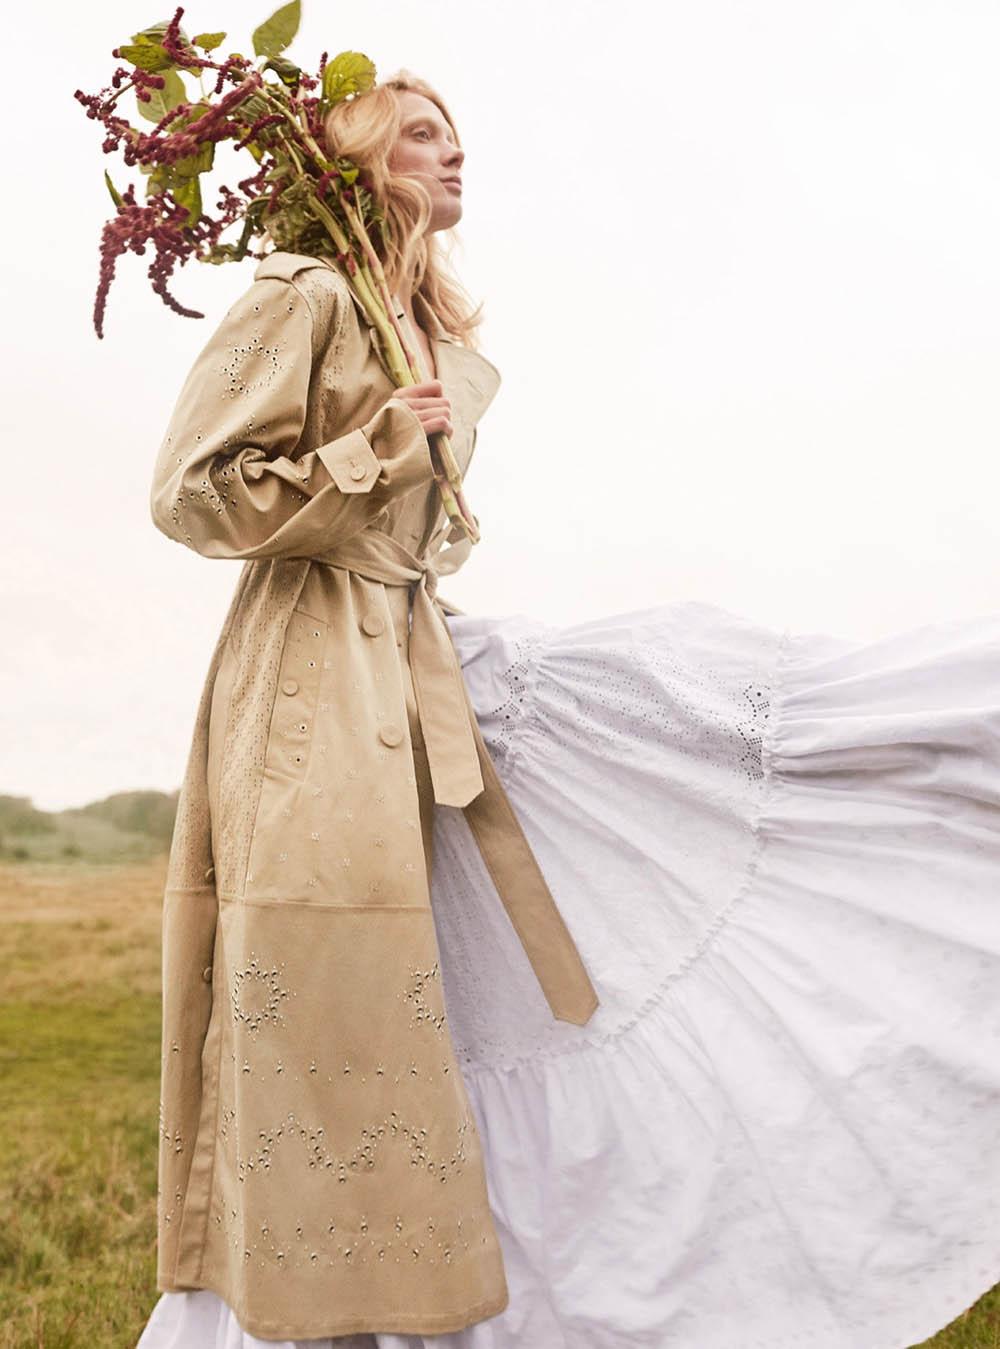 Annely Bouma by Agata Pospieszynska for Harper's Bazaar UK April 2020